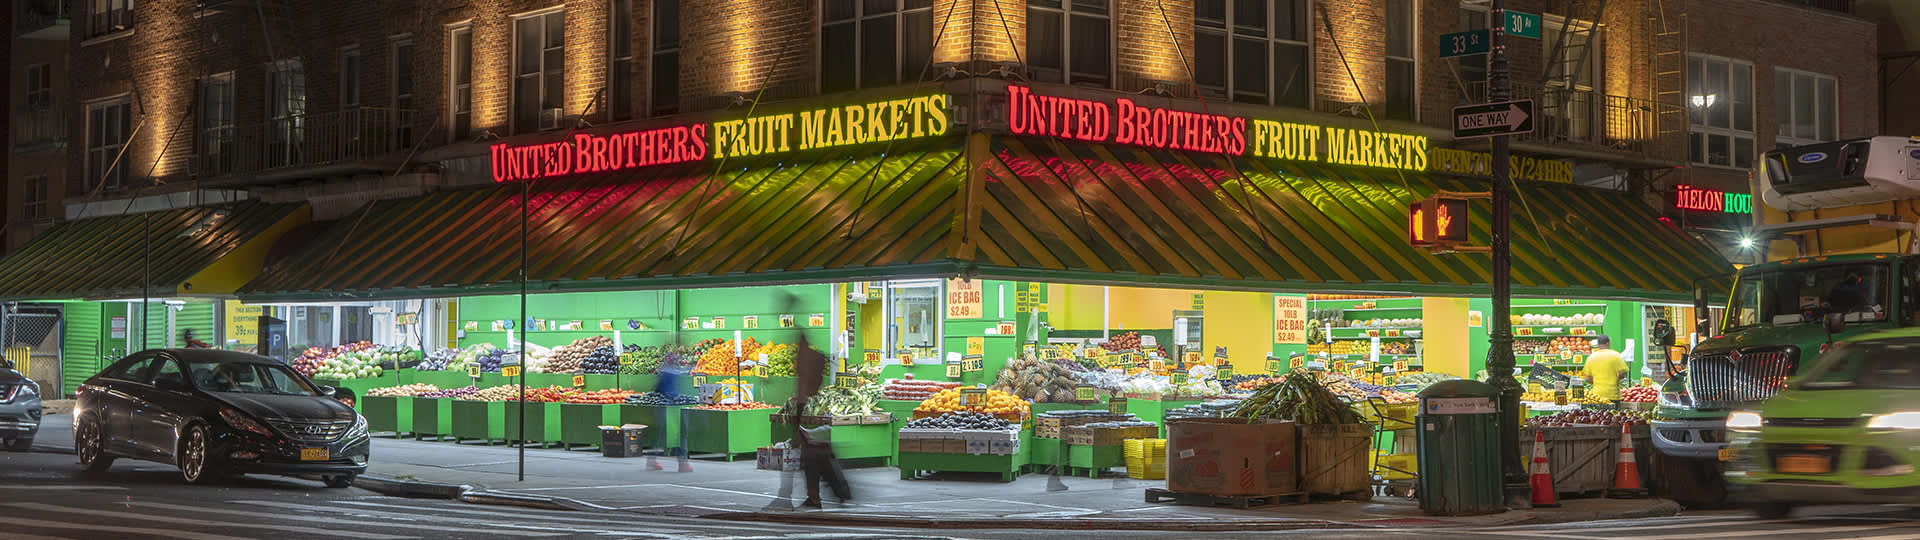 Mercado de frutas da United Brothers, Astoria, Queens